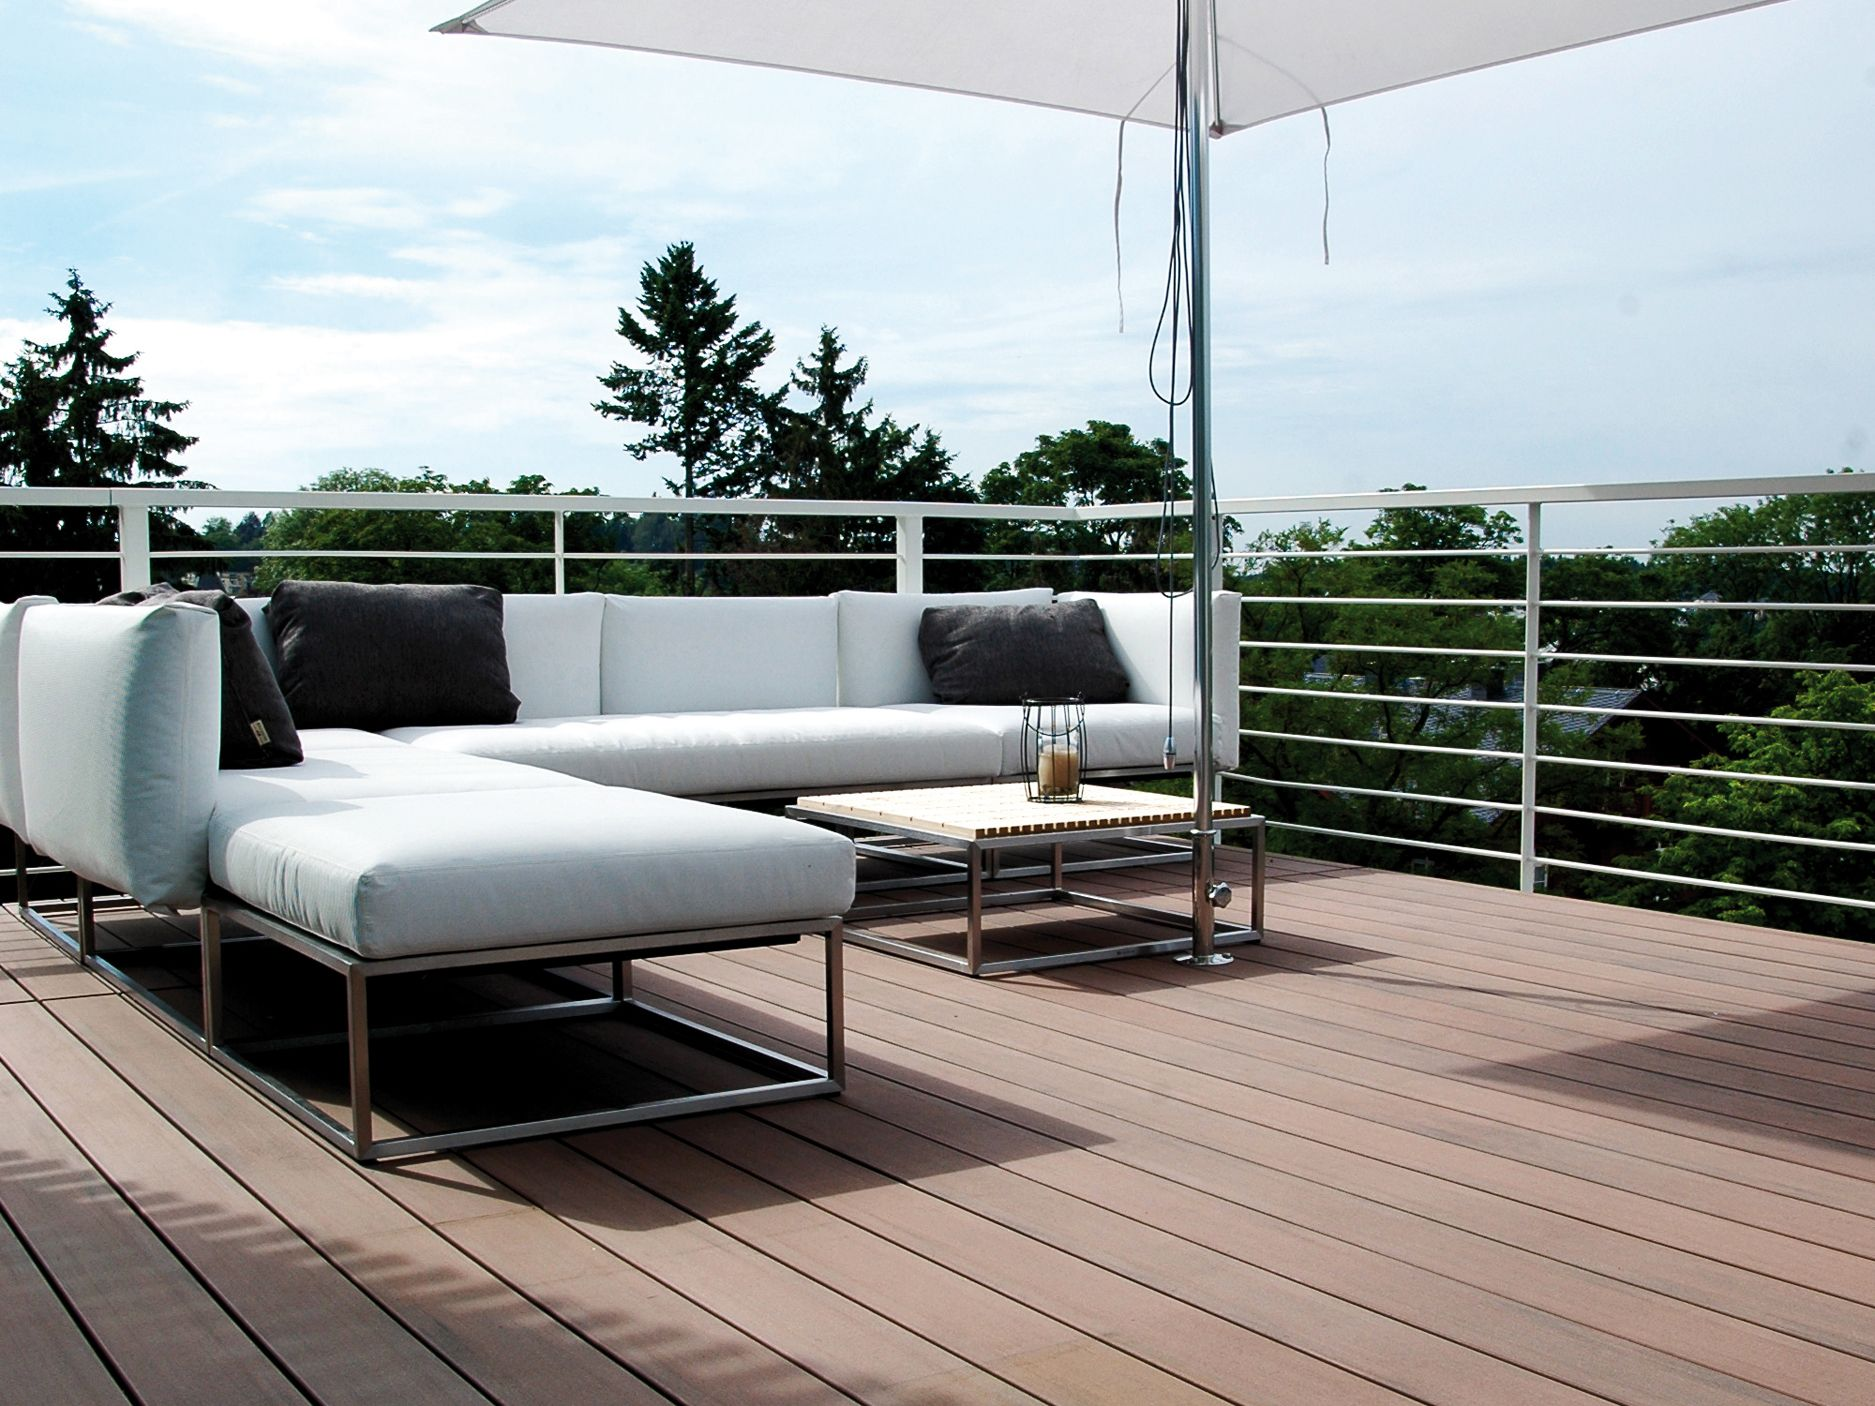 how to landscape under unlevel deck,install deck wpc